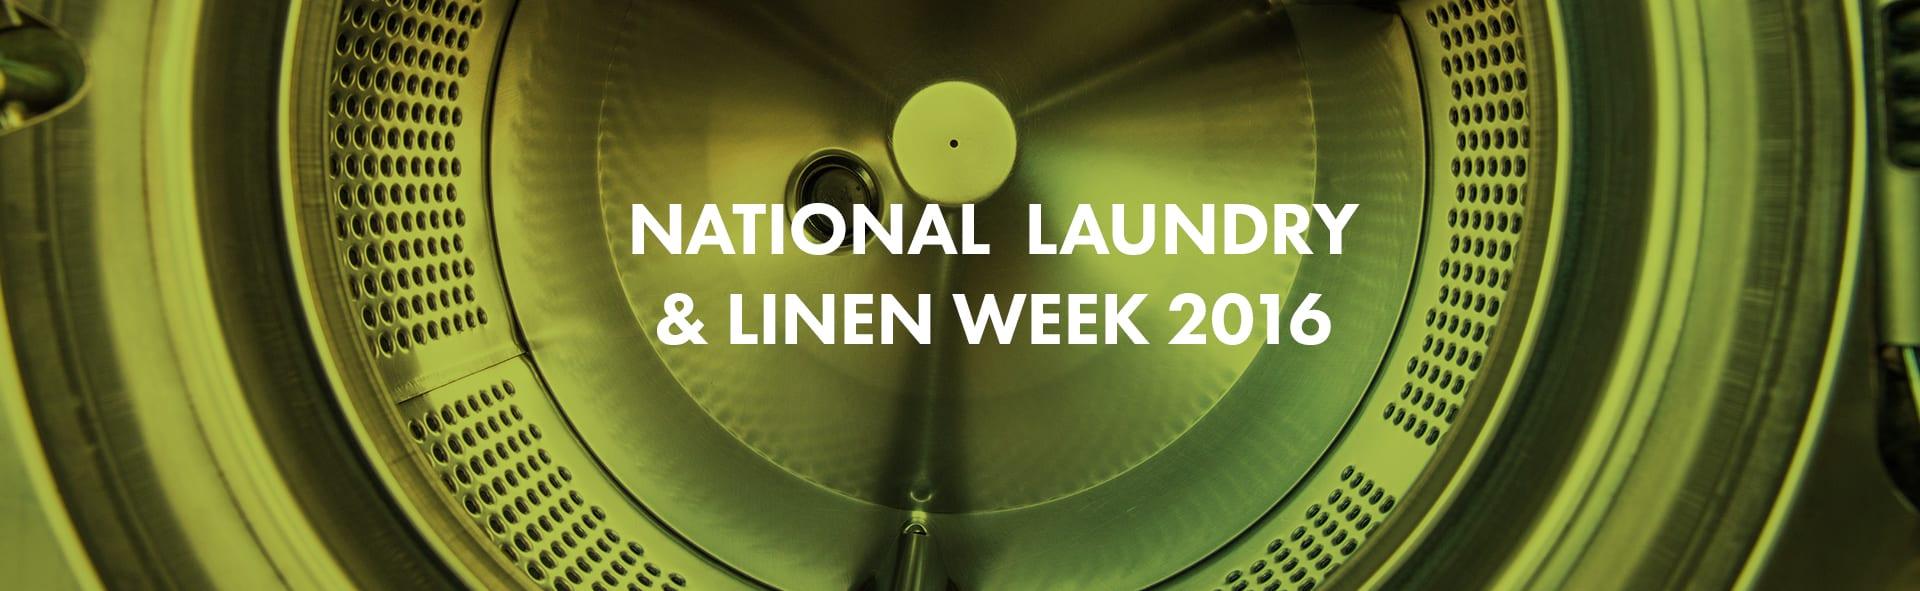 National Laundry & Linen Week 2016 Banner